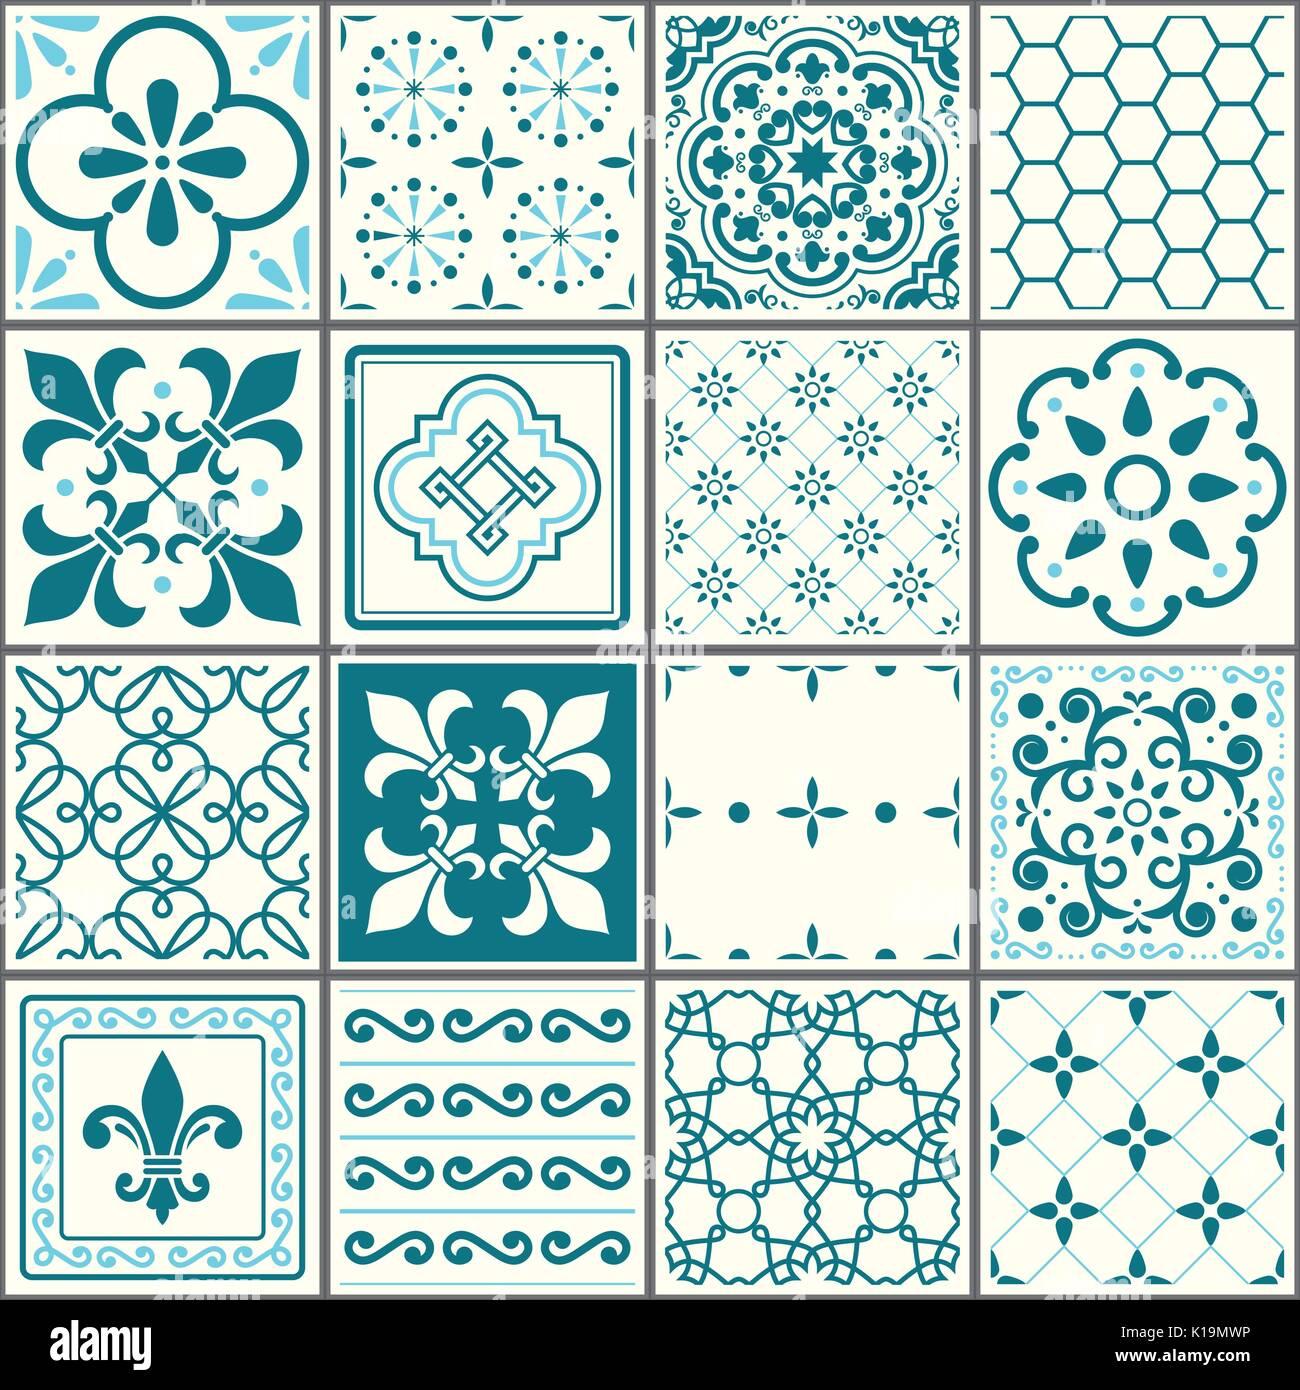 Portuguese tiles pattern, Lisbon seamless turquoise tiles, Azulejos vintage geometric ceramic design - Stock Vector